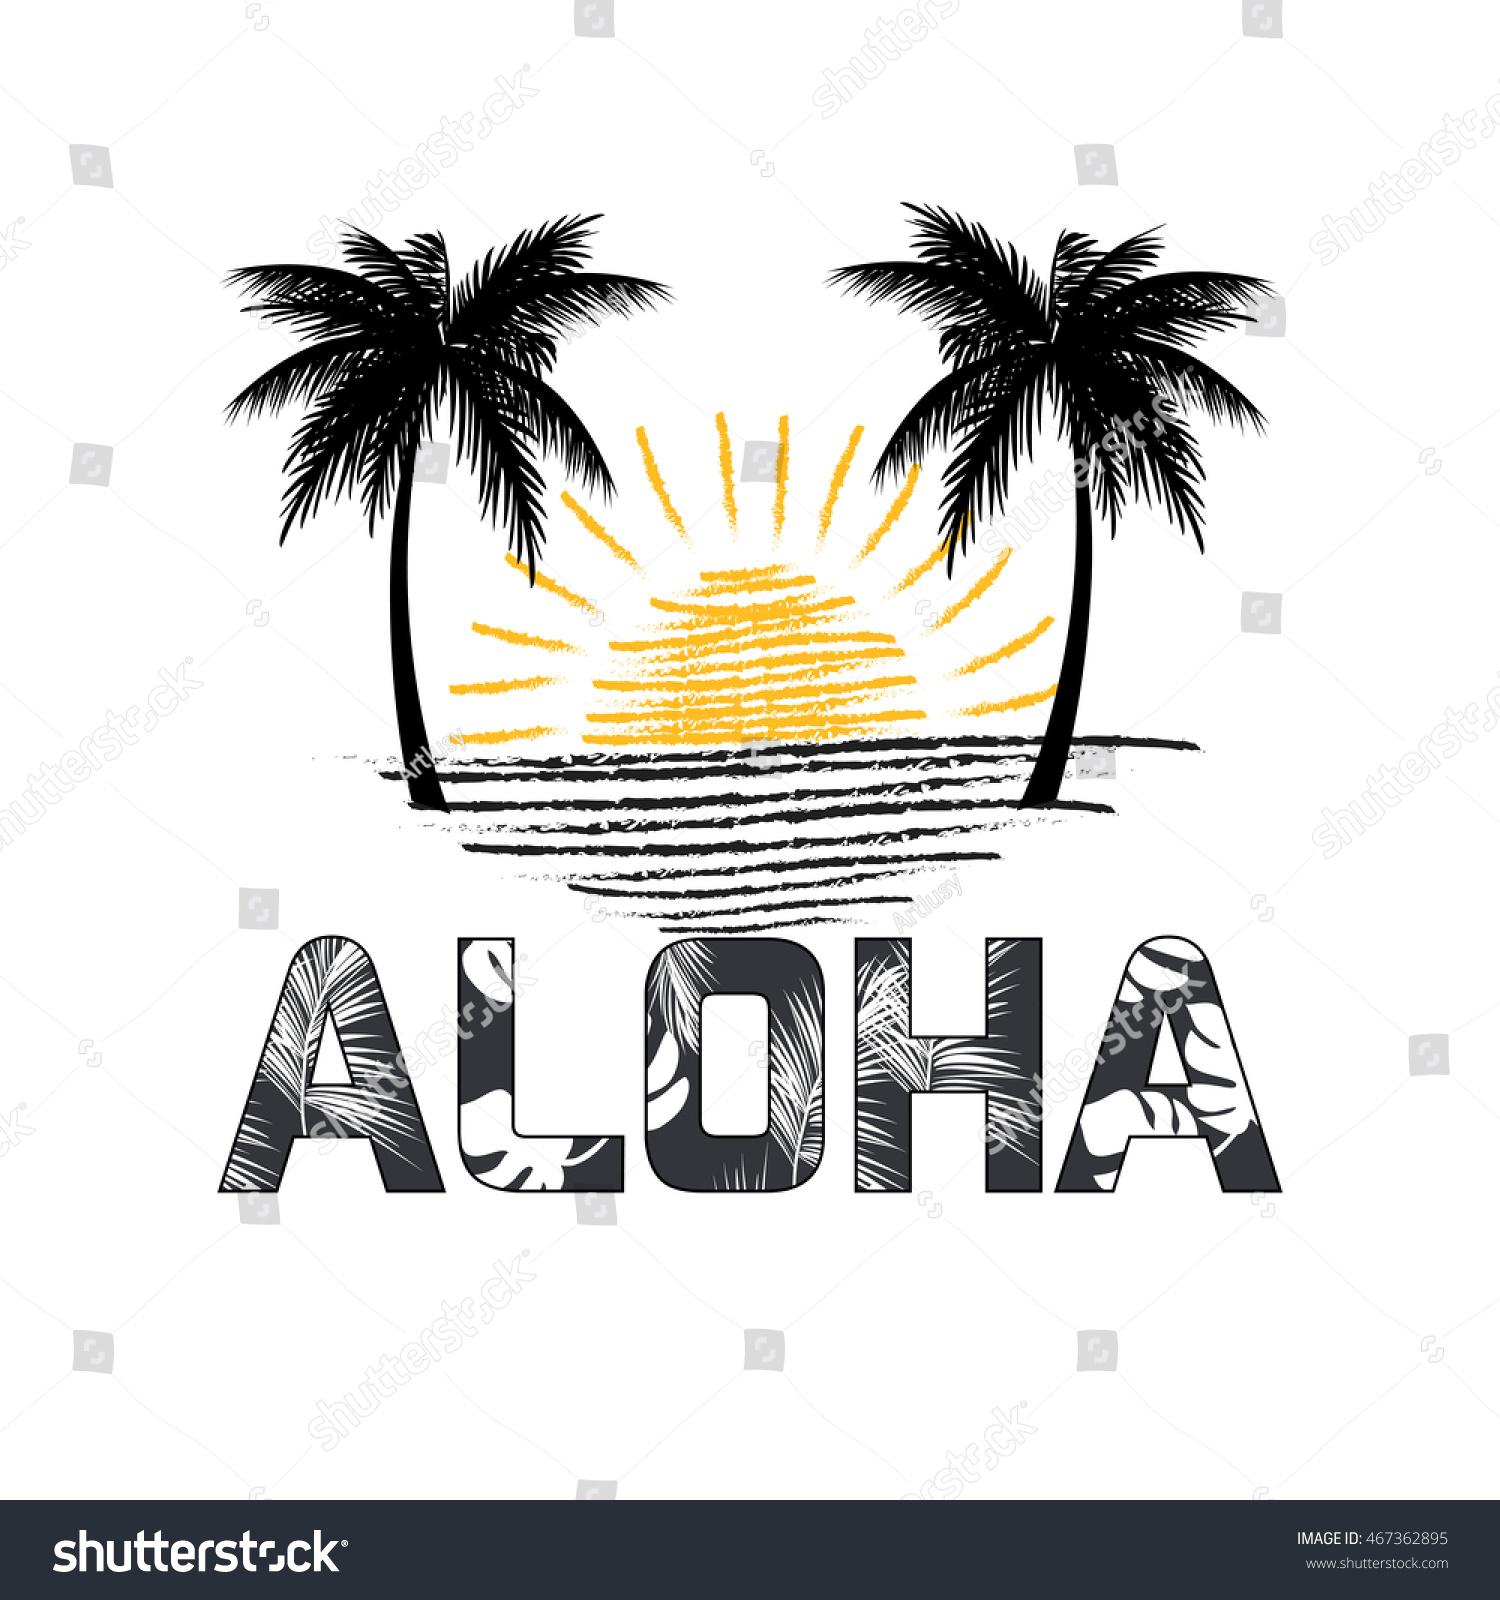 T shirt design hawaii - Aloha Hawaii Aloha T Shirt Design Best Creative Design For Poster Flyer